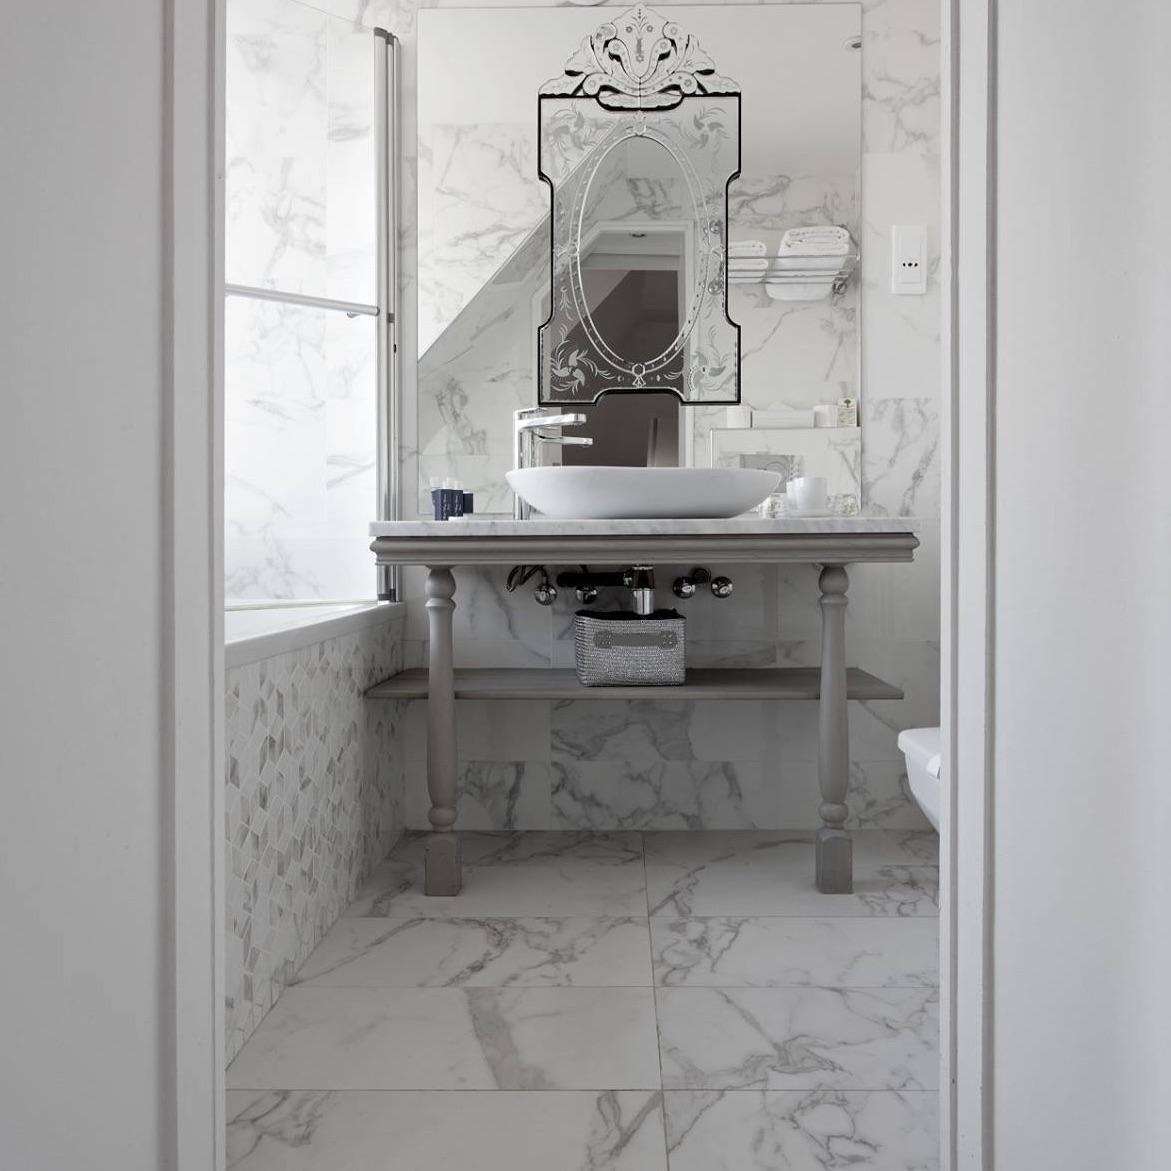 The Ten Best Tiles For Small Bathroom Spaces Porcelain regarding size 1171 X 1171